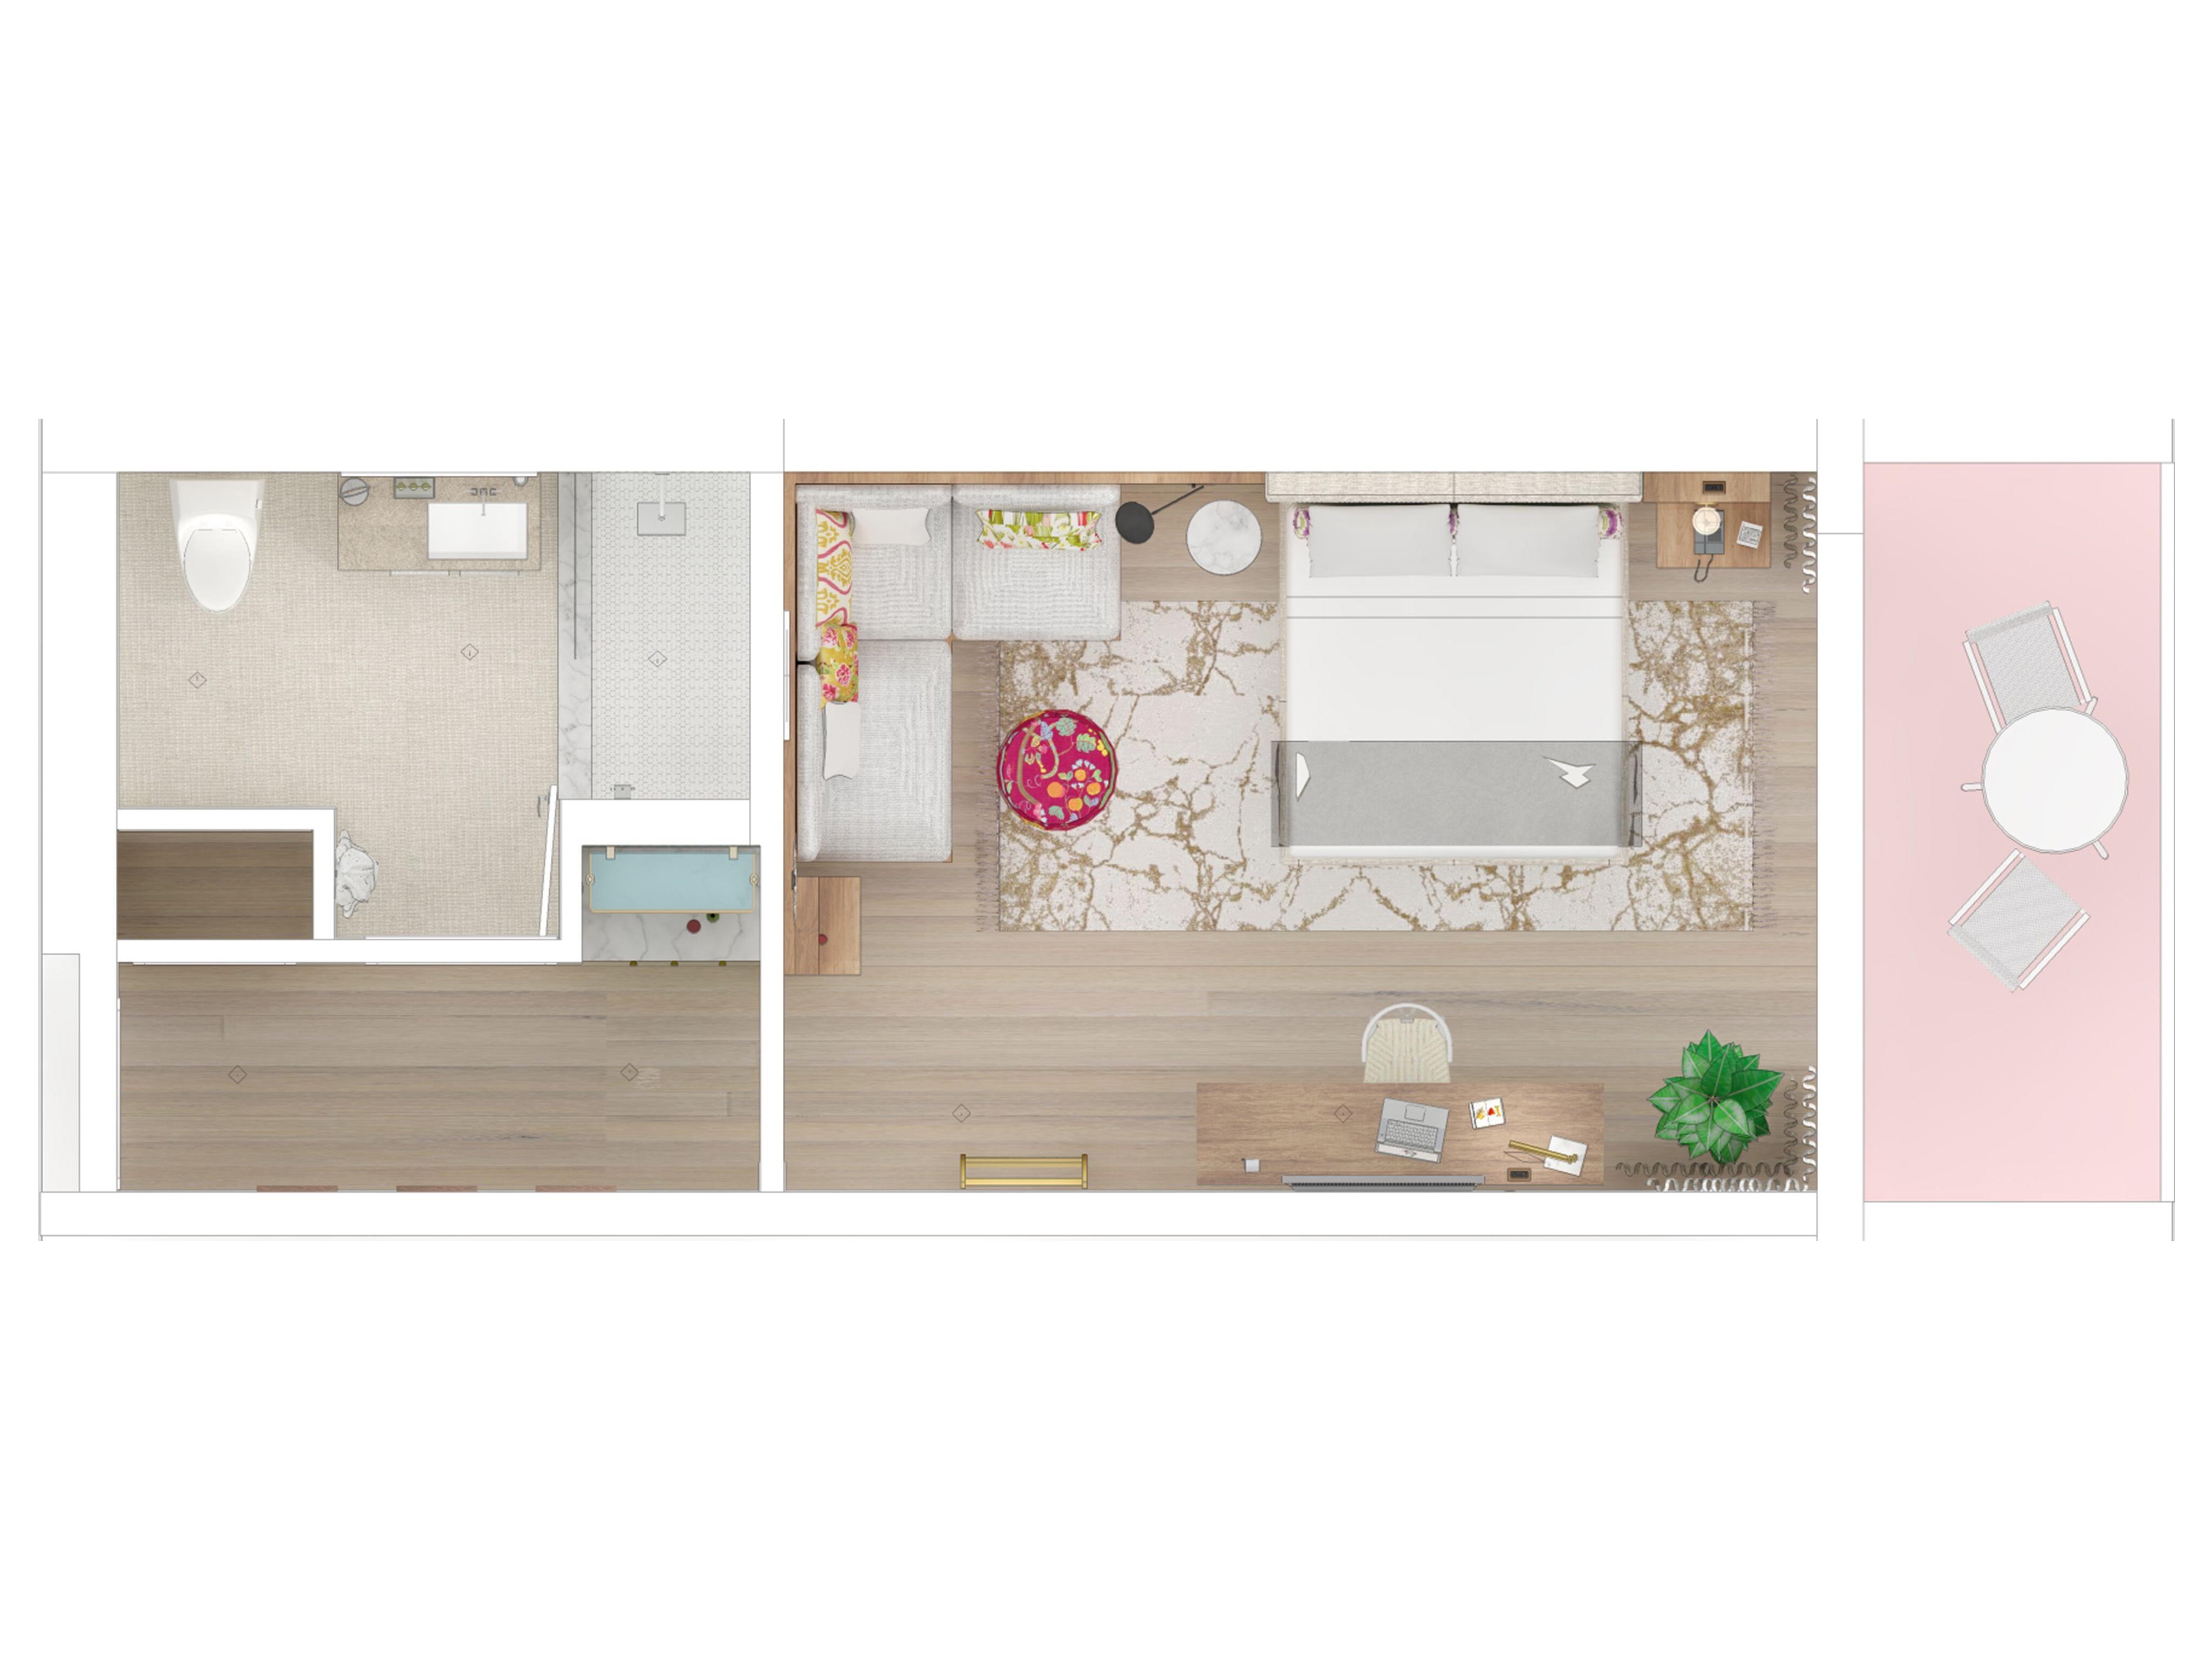 floor plan of one bedroom, bathroom and balcony